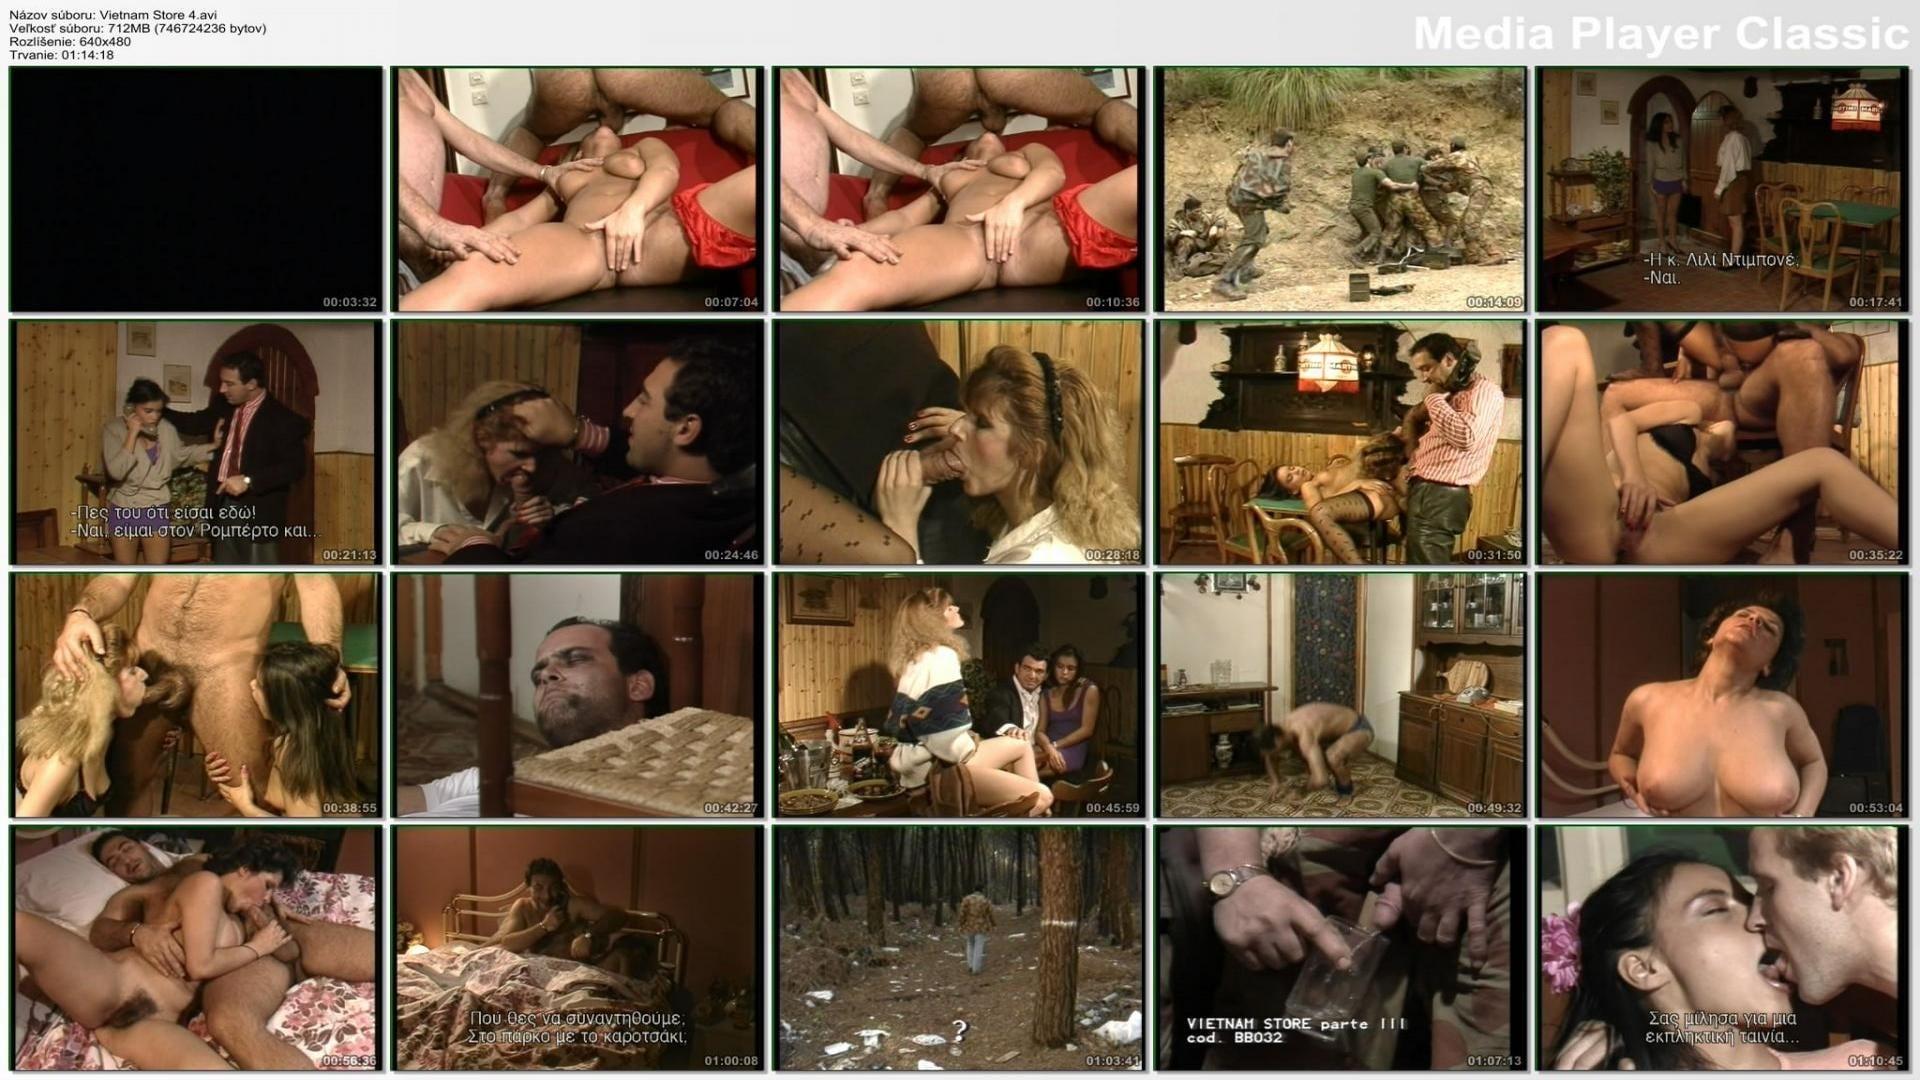 vetnamskie-porno-filmi